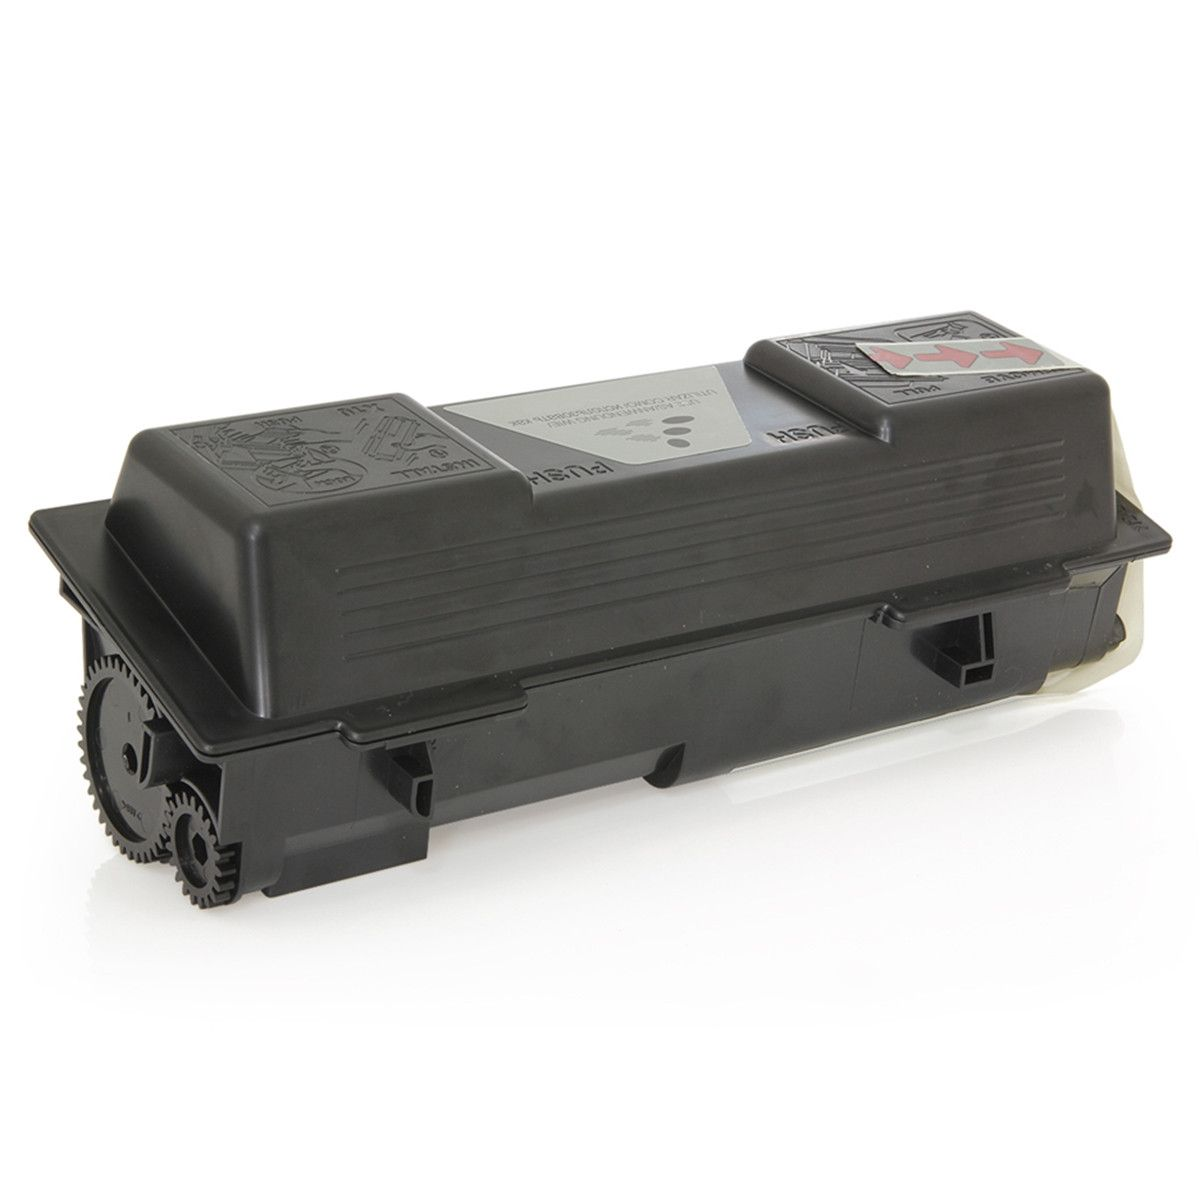 Toner compatível com KYOCERA TK1147 M2035DN FS1035 FS1135 FS1035DP FS1035L FS1135L M2535 12.000 Páginas - Cartucho & Cia